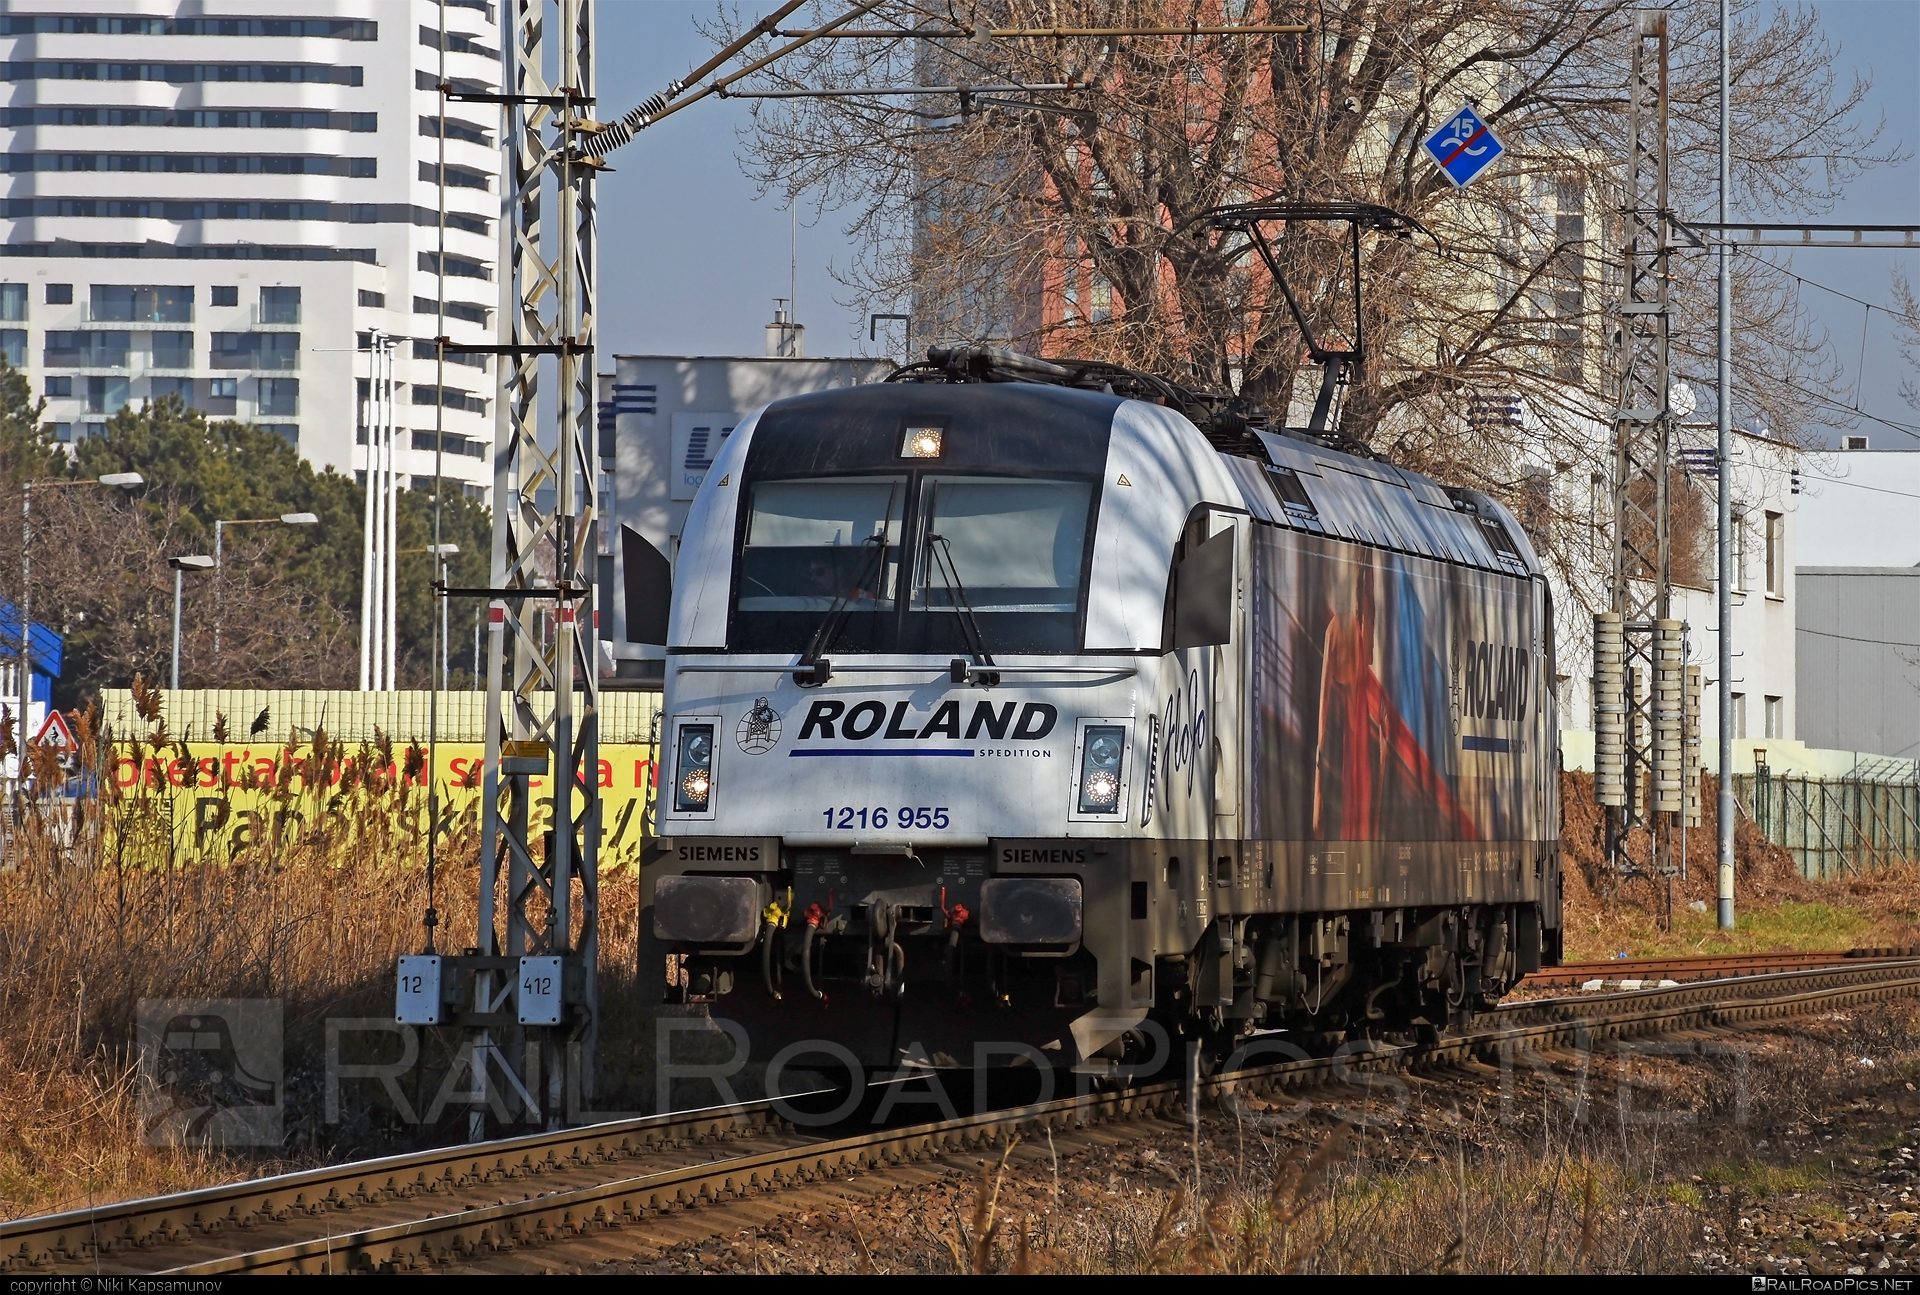 Siemens ES 64 U4 - 1216 955 operated by Wiener Lokalbahnen Cargo GmbH #es64 #es64u #es64u4 #eurosprinter #flojo #roland #rolandspedition #siemens #siemenses64 #siemenses64u #siemenses64u4 #siemenstaurus #taurus #tauruslocomotive #wienerlokalbahnencargo #wienerlokalbahnencargogmbh #wlc